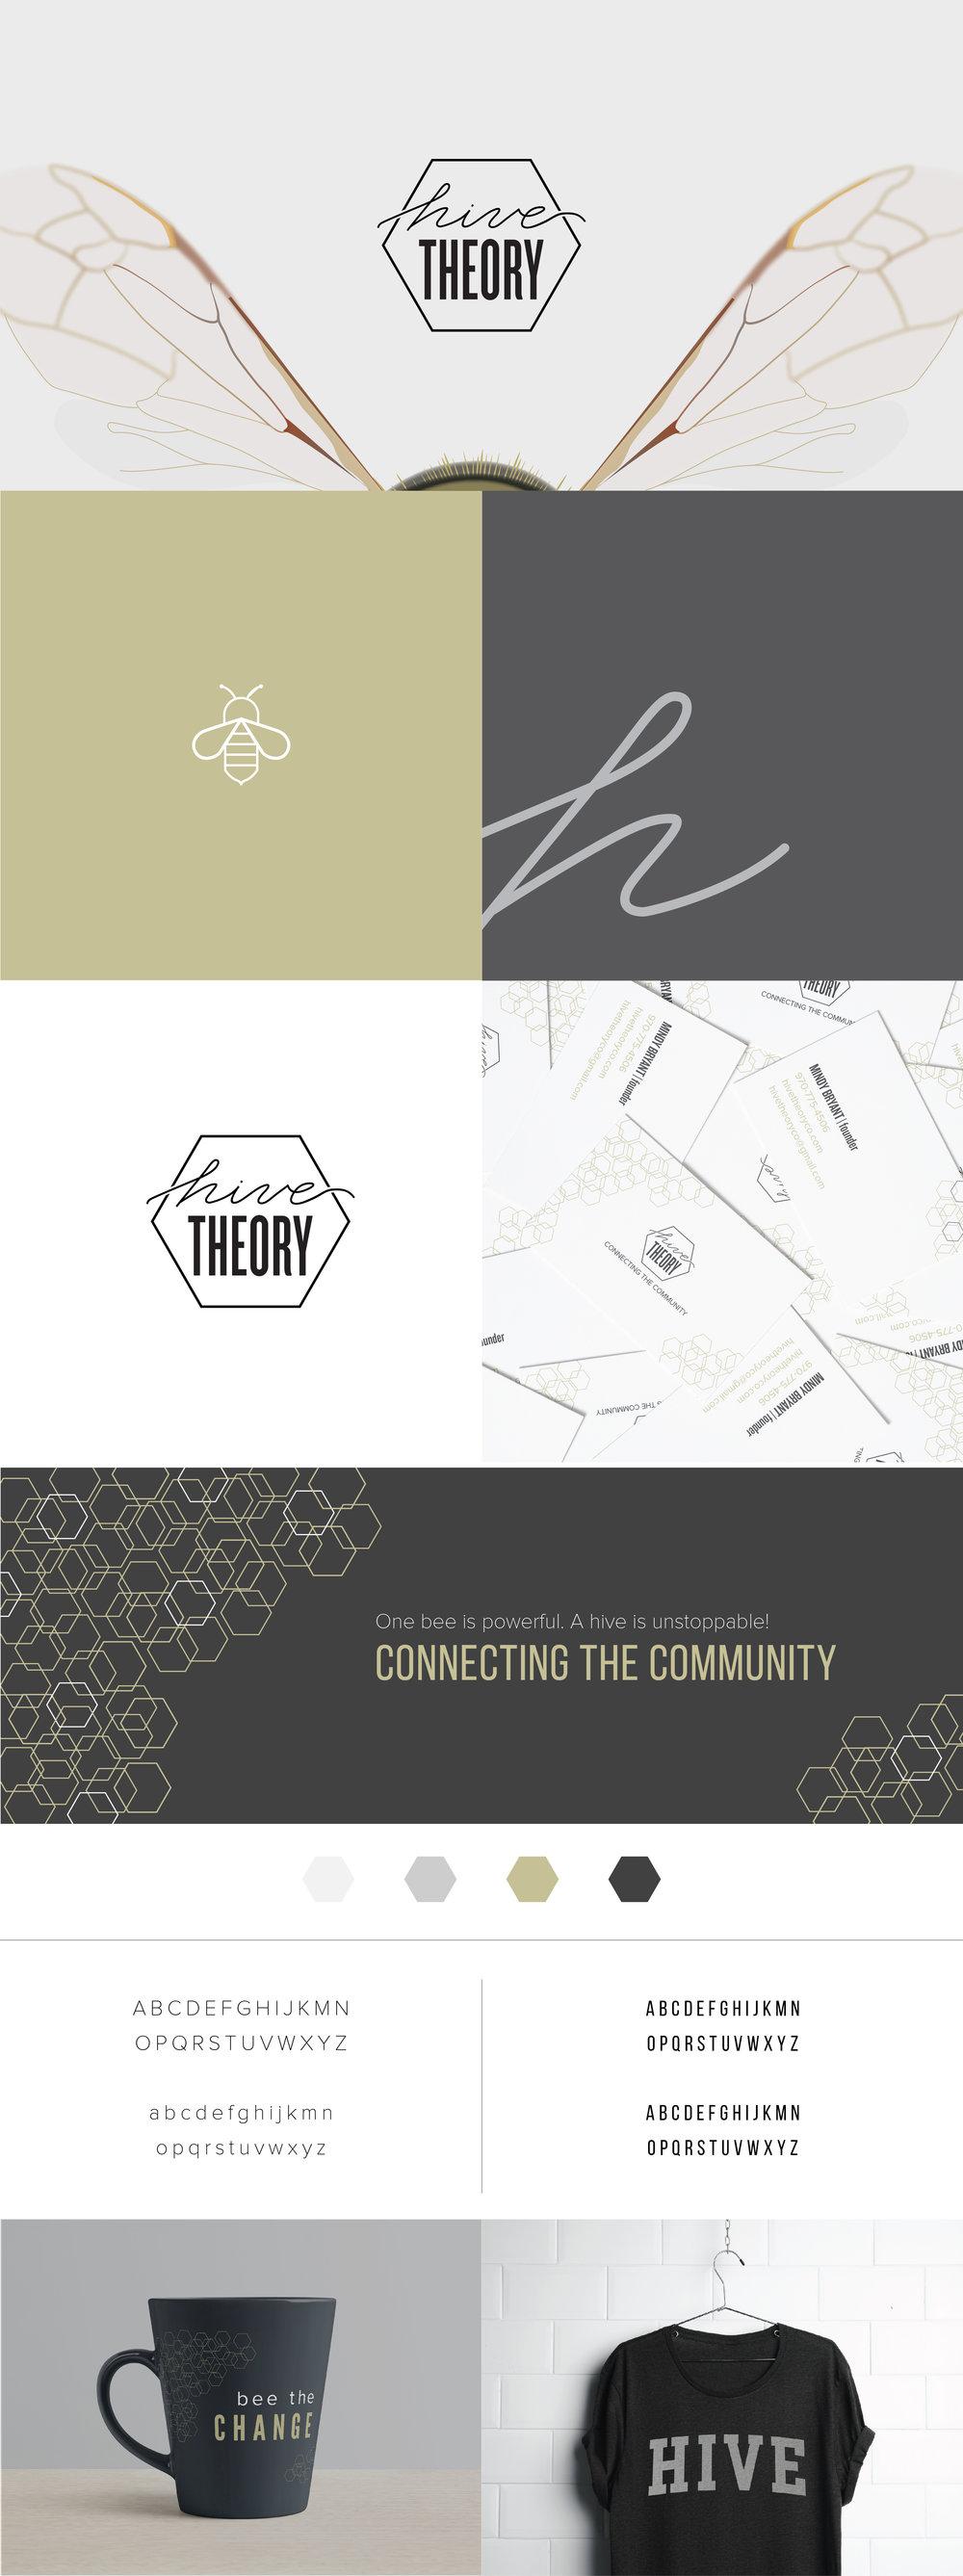 HiveTheory_BrandReveal-01.jpg